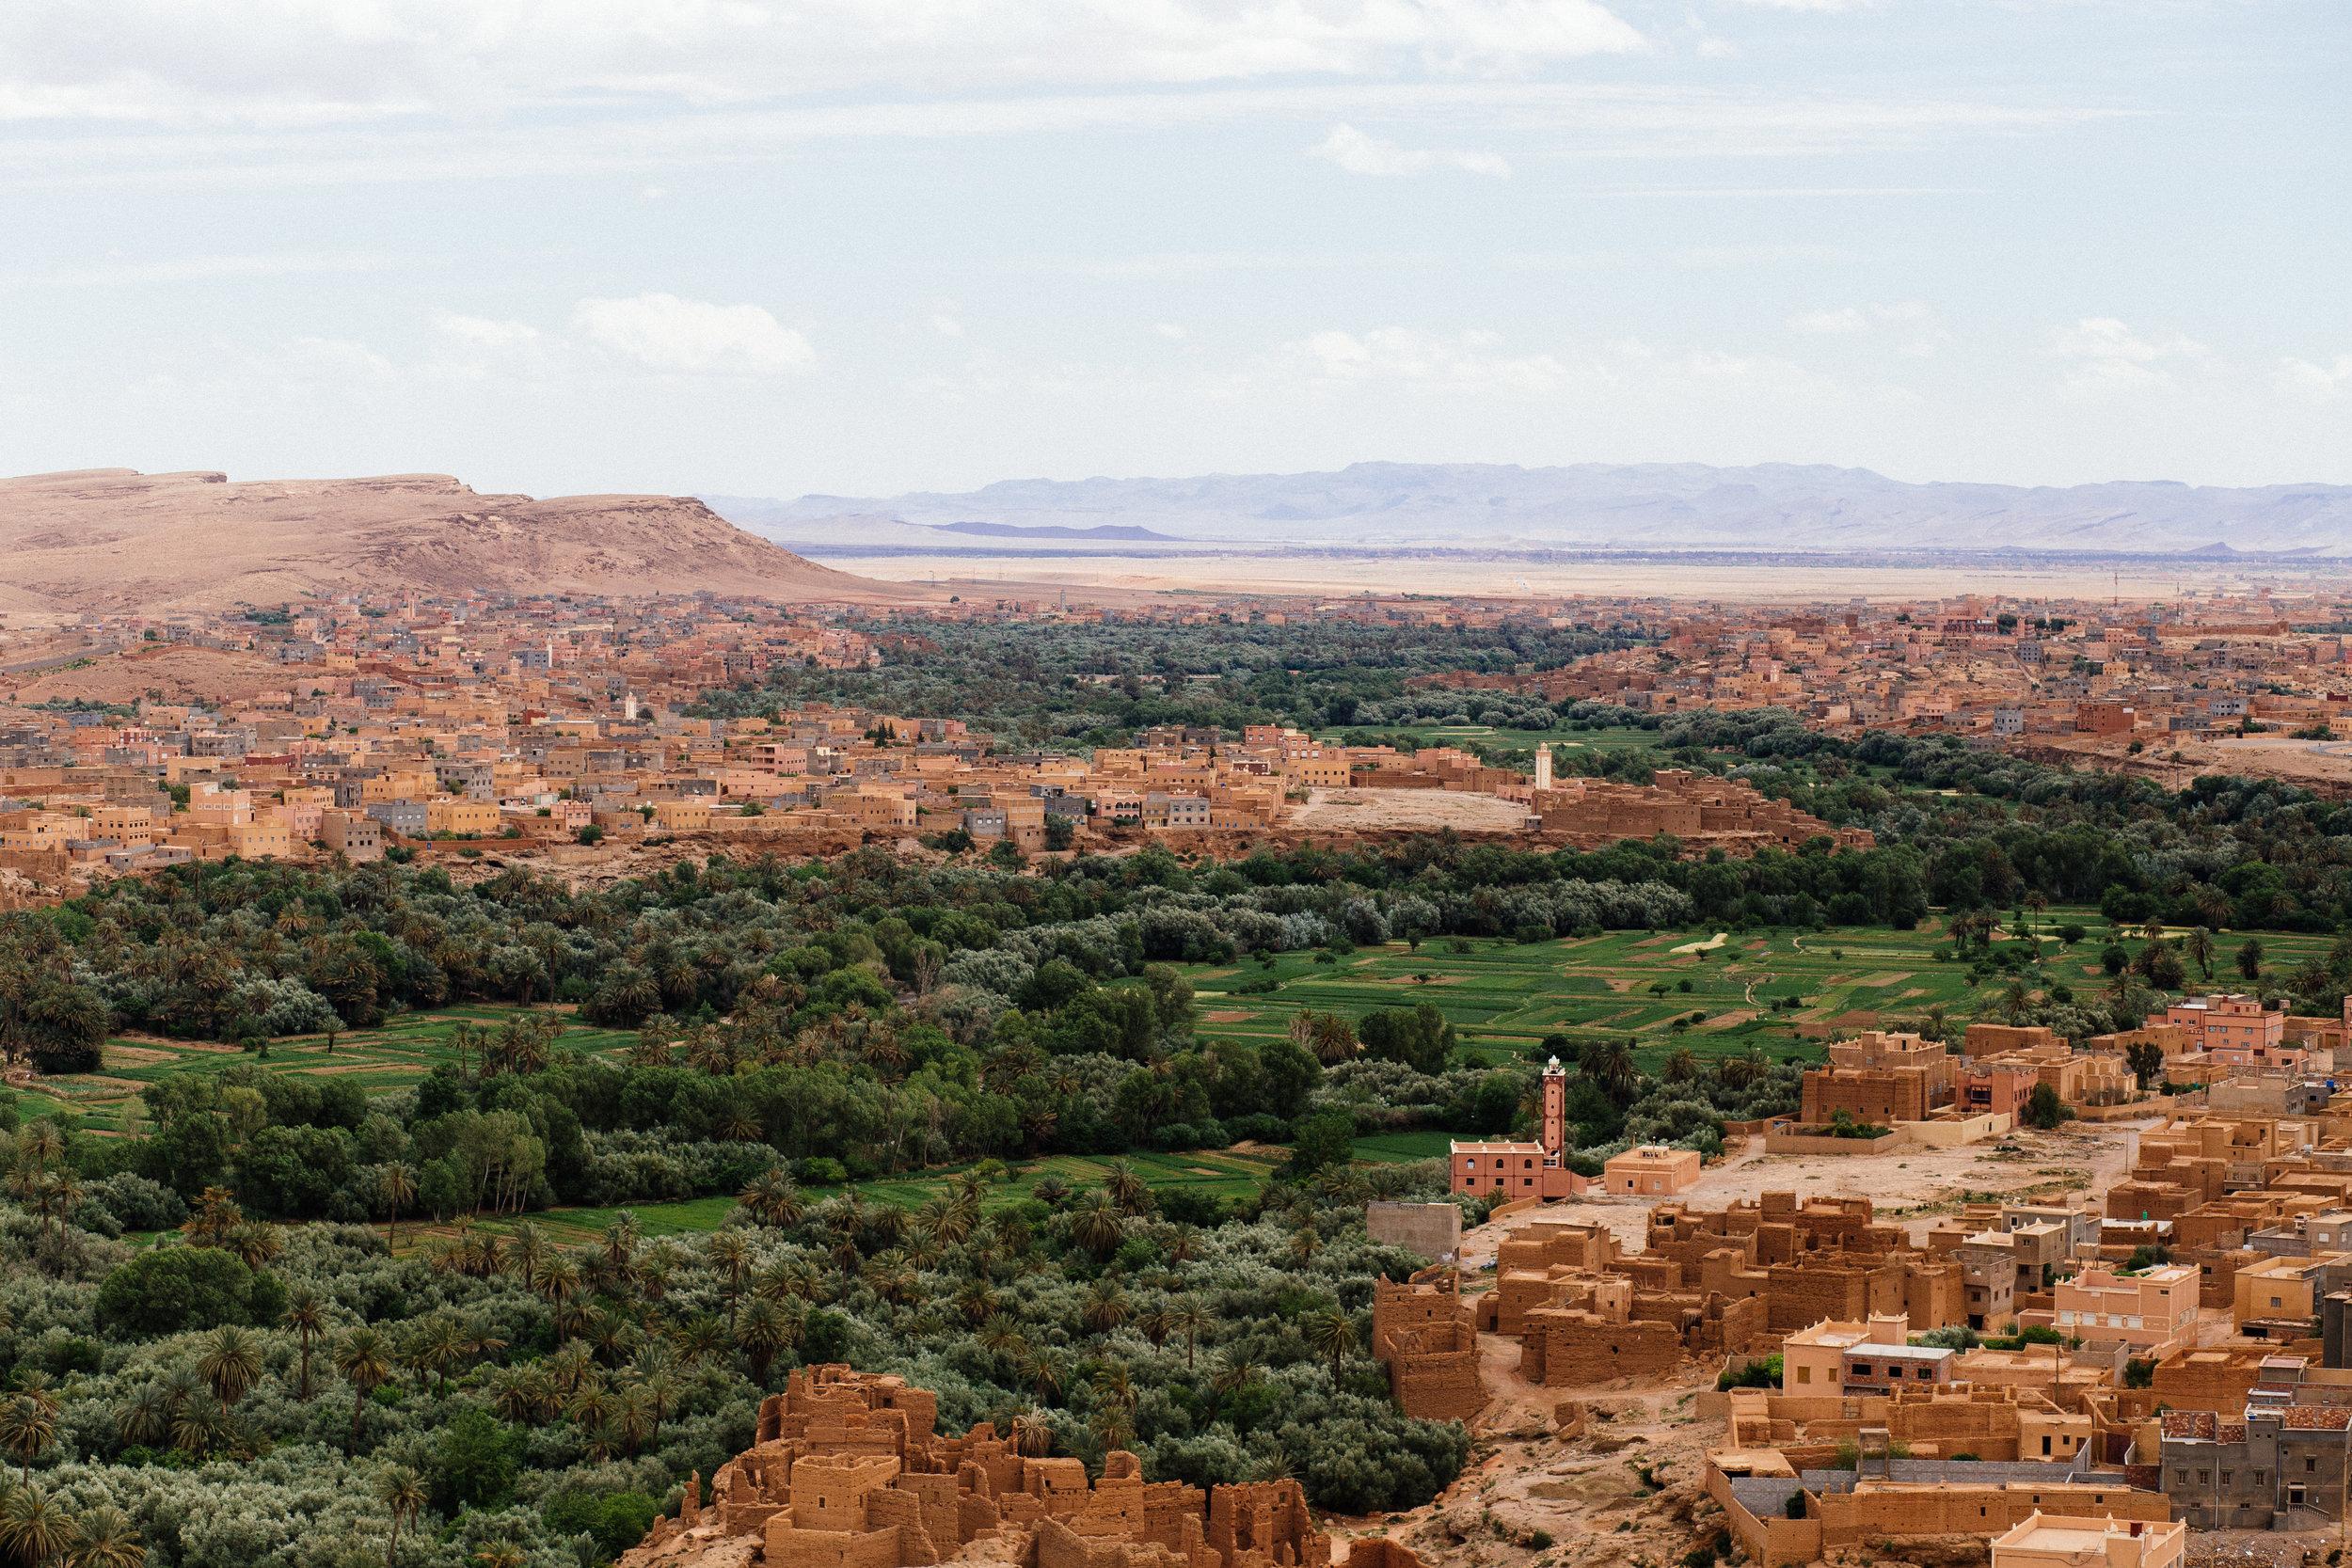 morocco-morocco travel-visit morocco-travel-travel photography-travel photographer-alina mendoza-alina mendoza photography-122.jpg